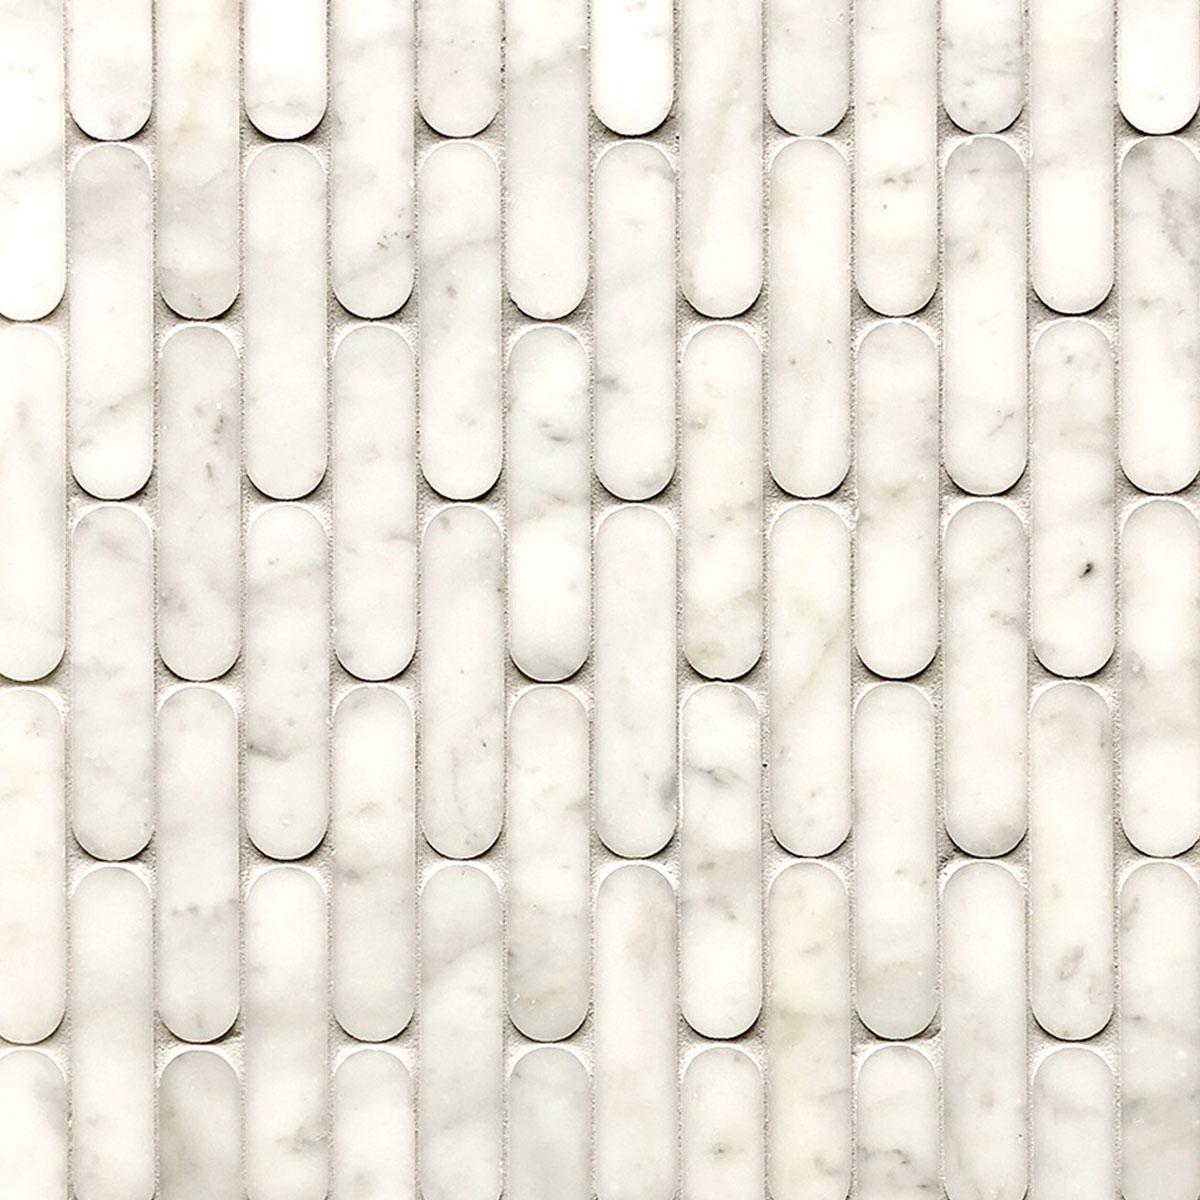 Tictax - Carrara C Honed - Mosaic and Feature Tiles - Stone3 Brisbane